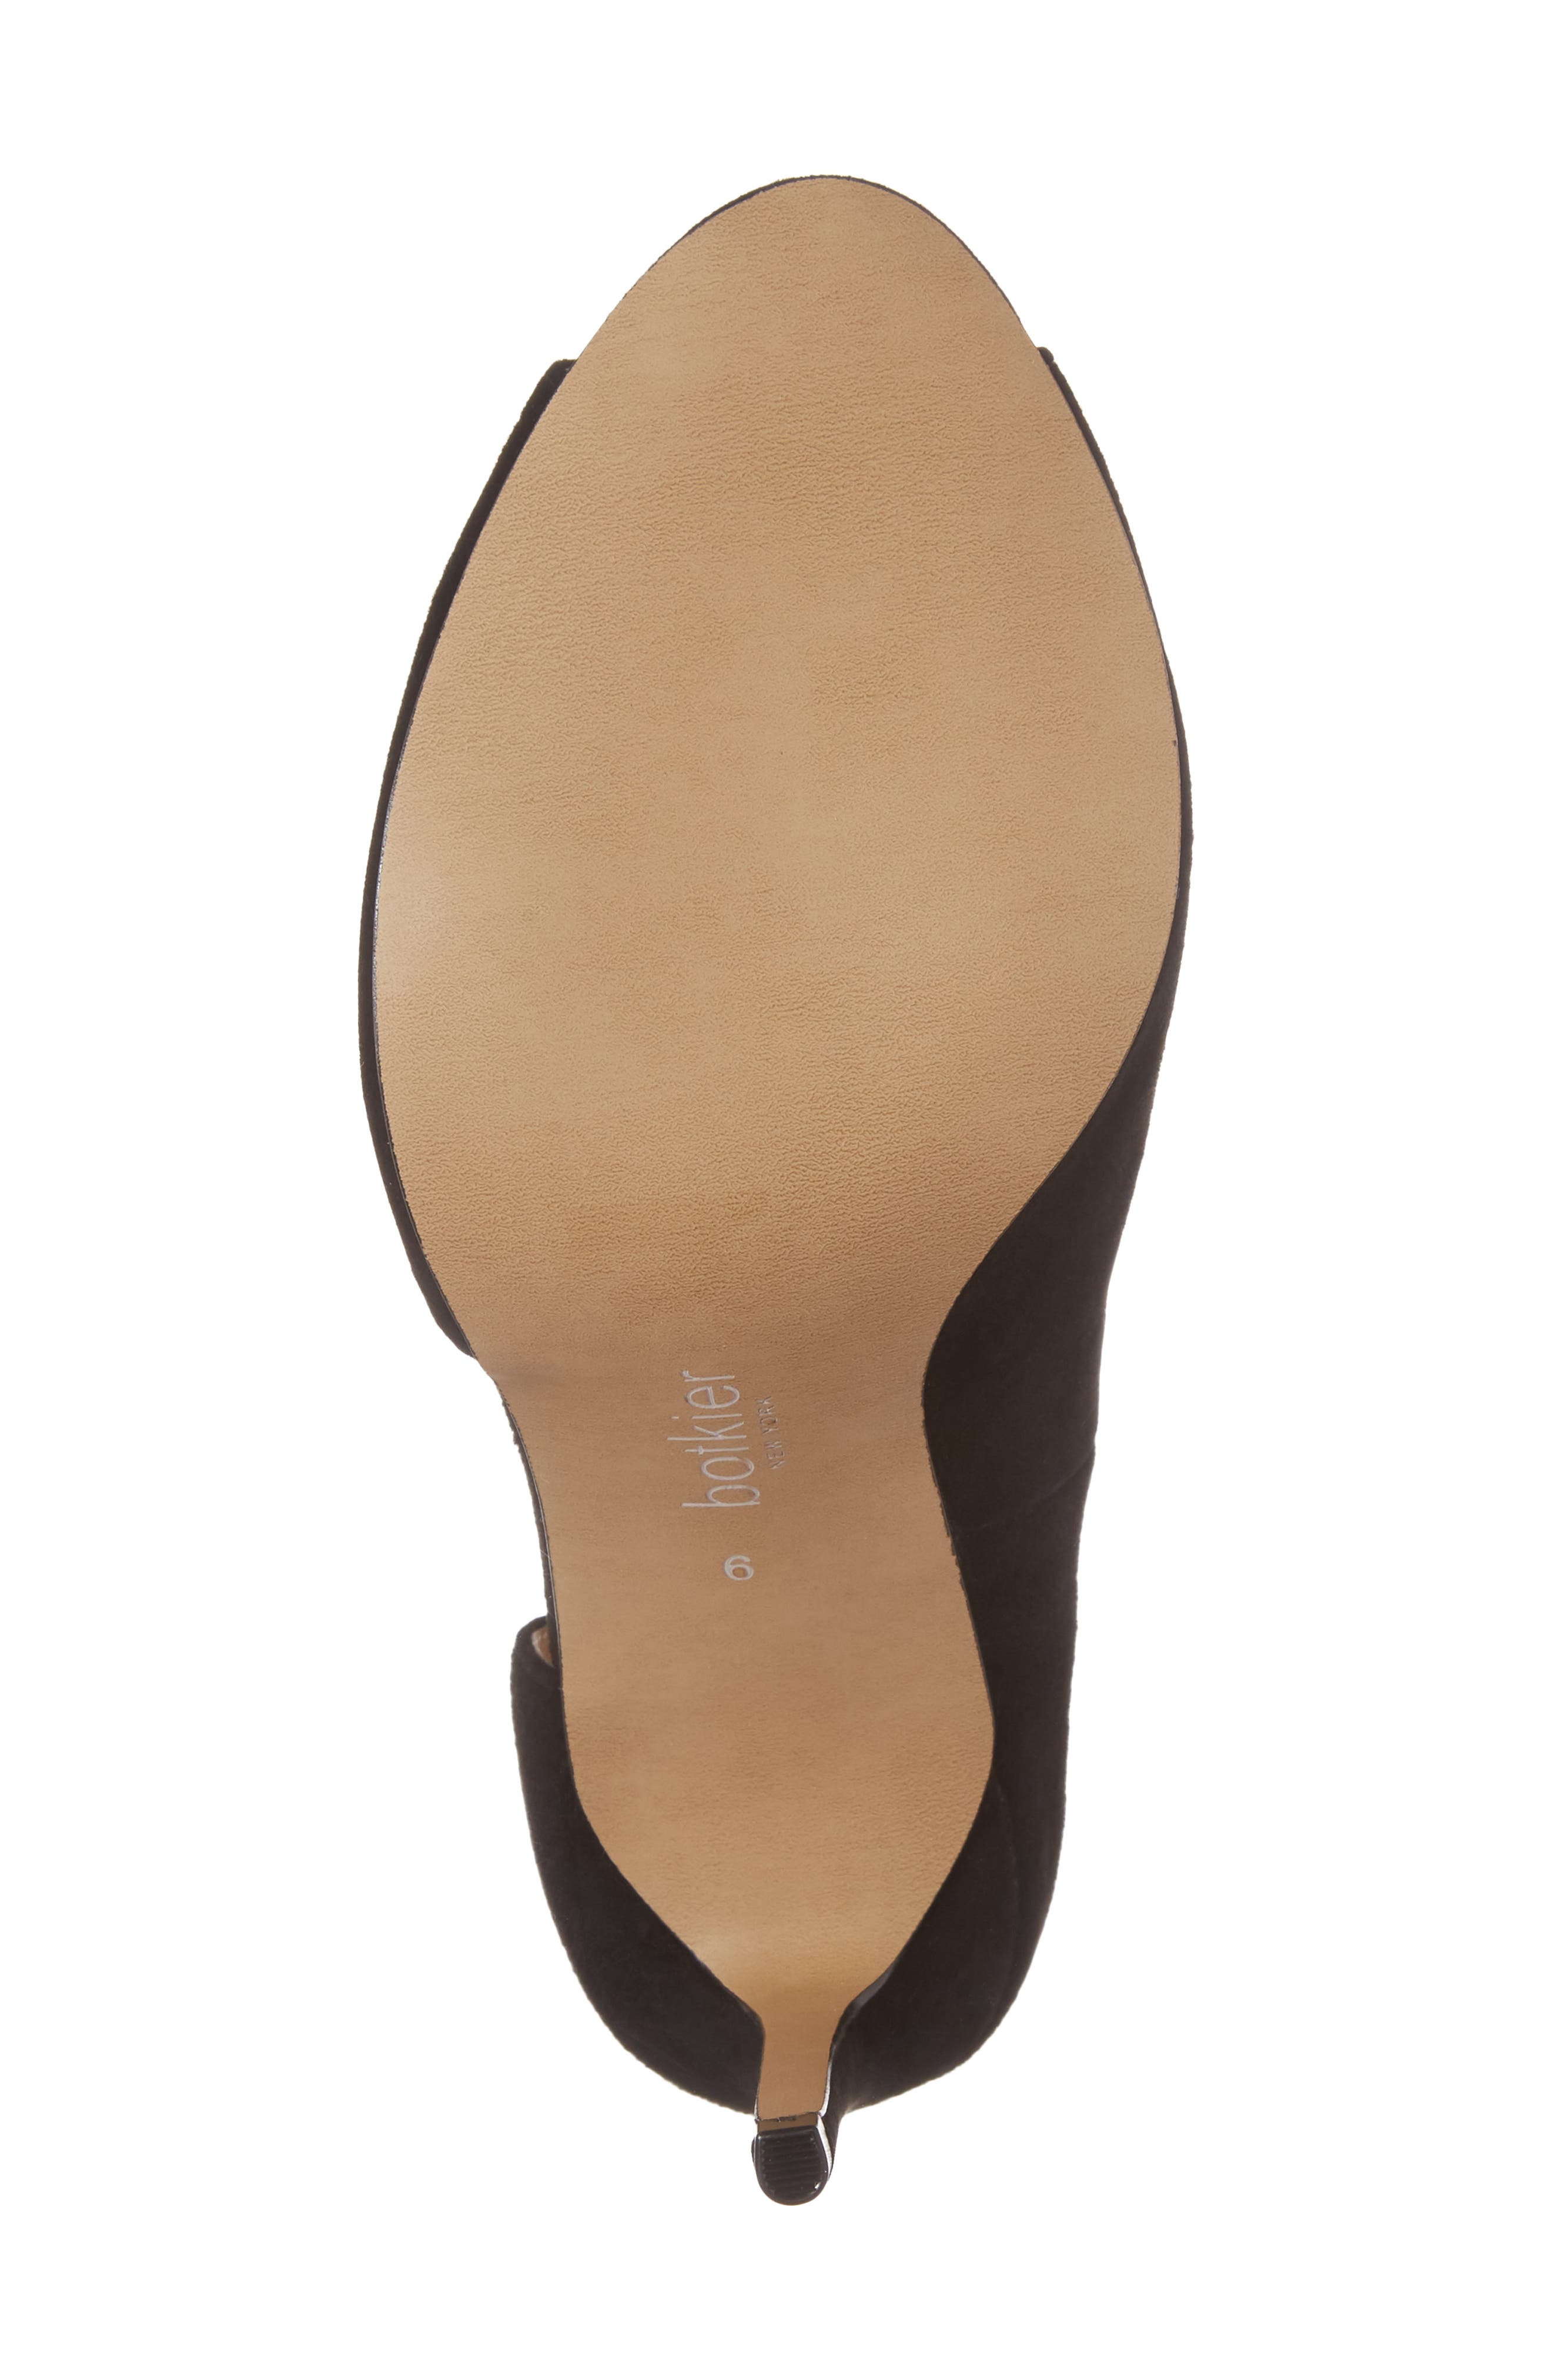 Adelia Asymmetrical Sandal,                             Alternate thumbnail 6, color,                             BLACK